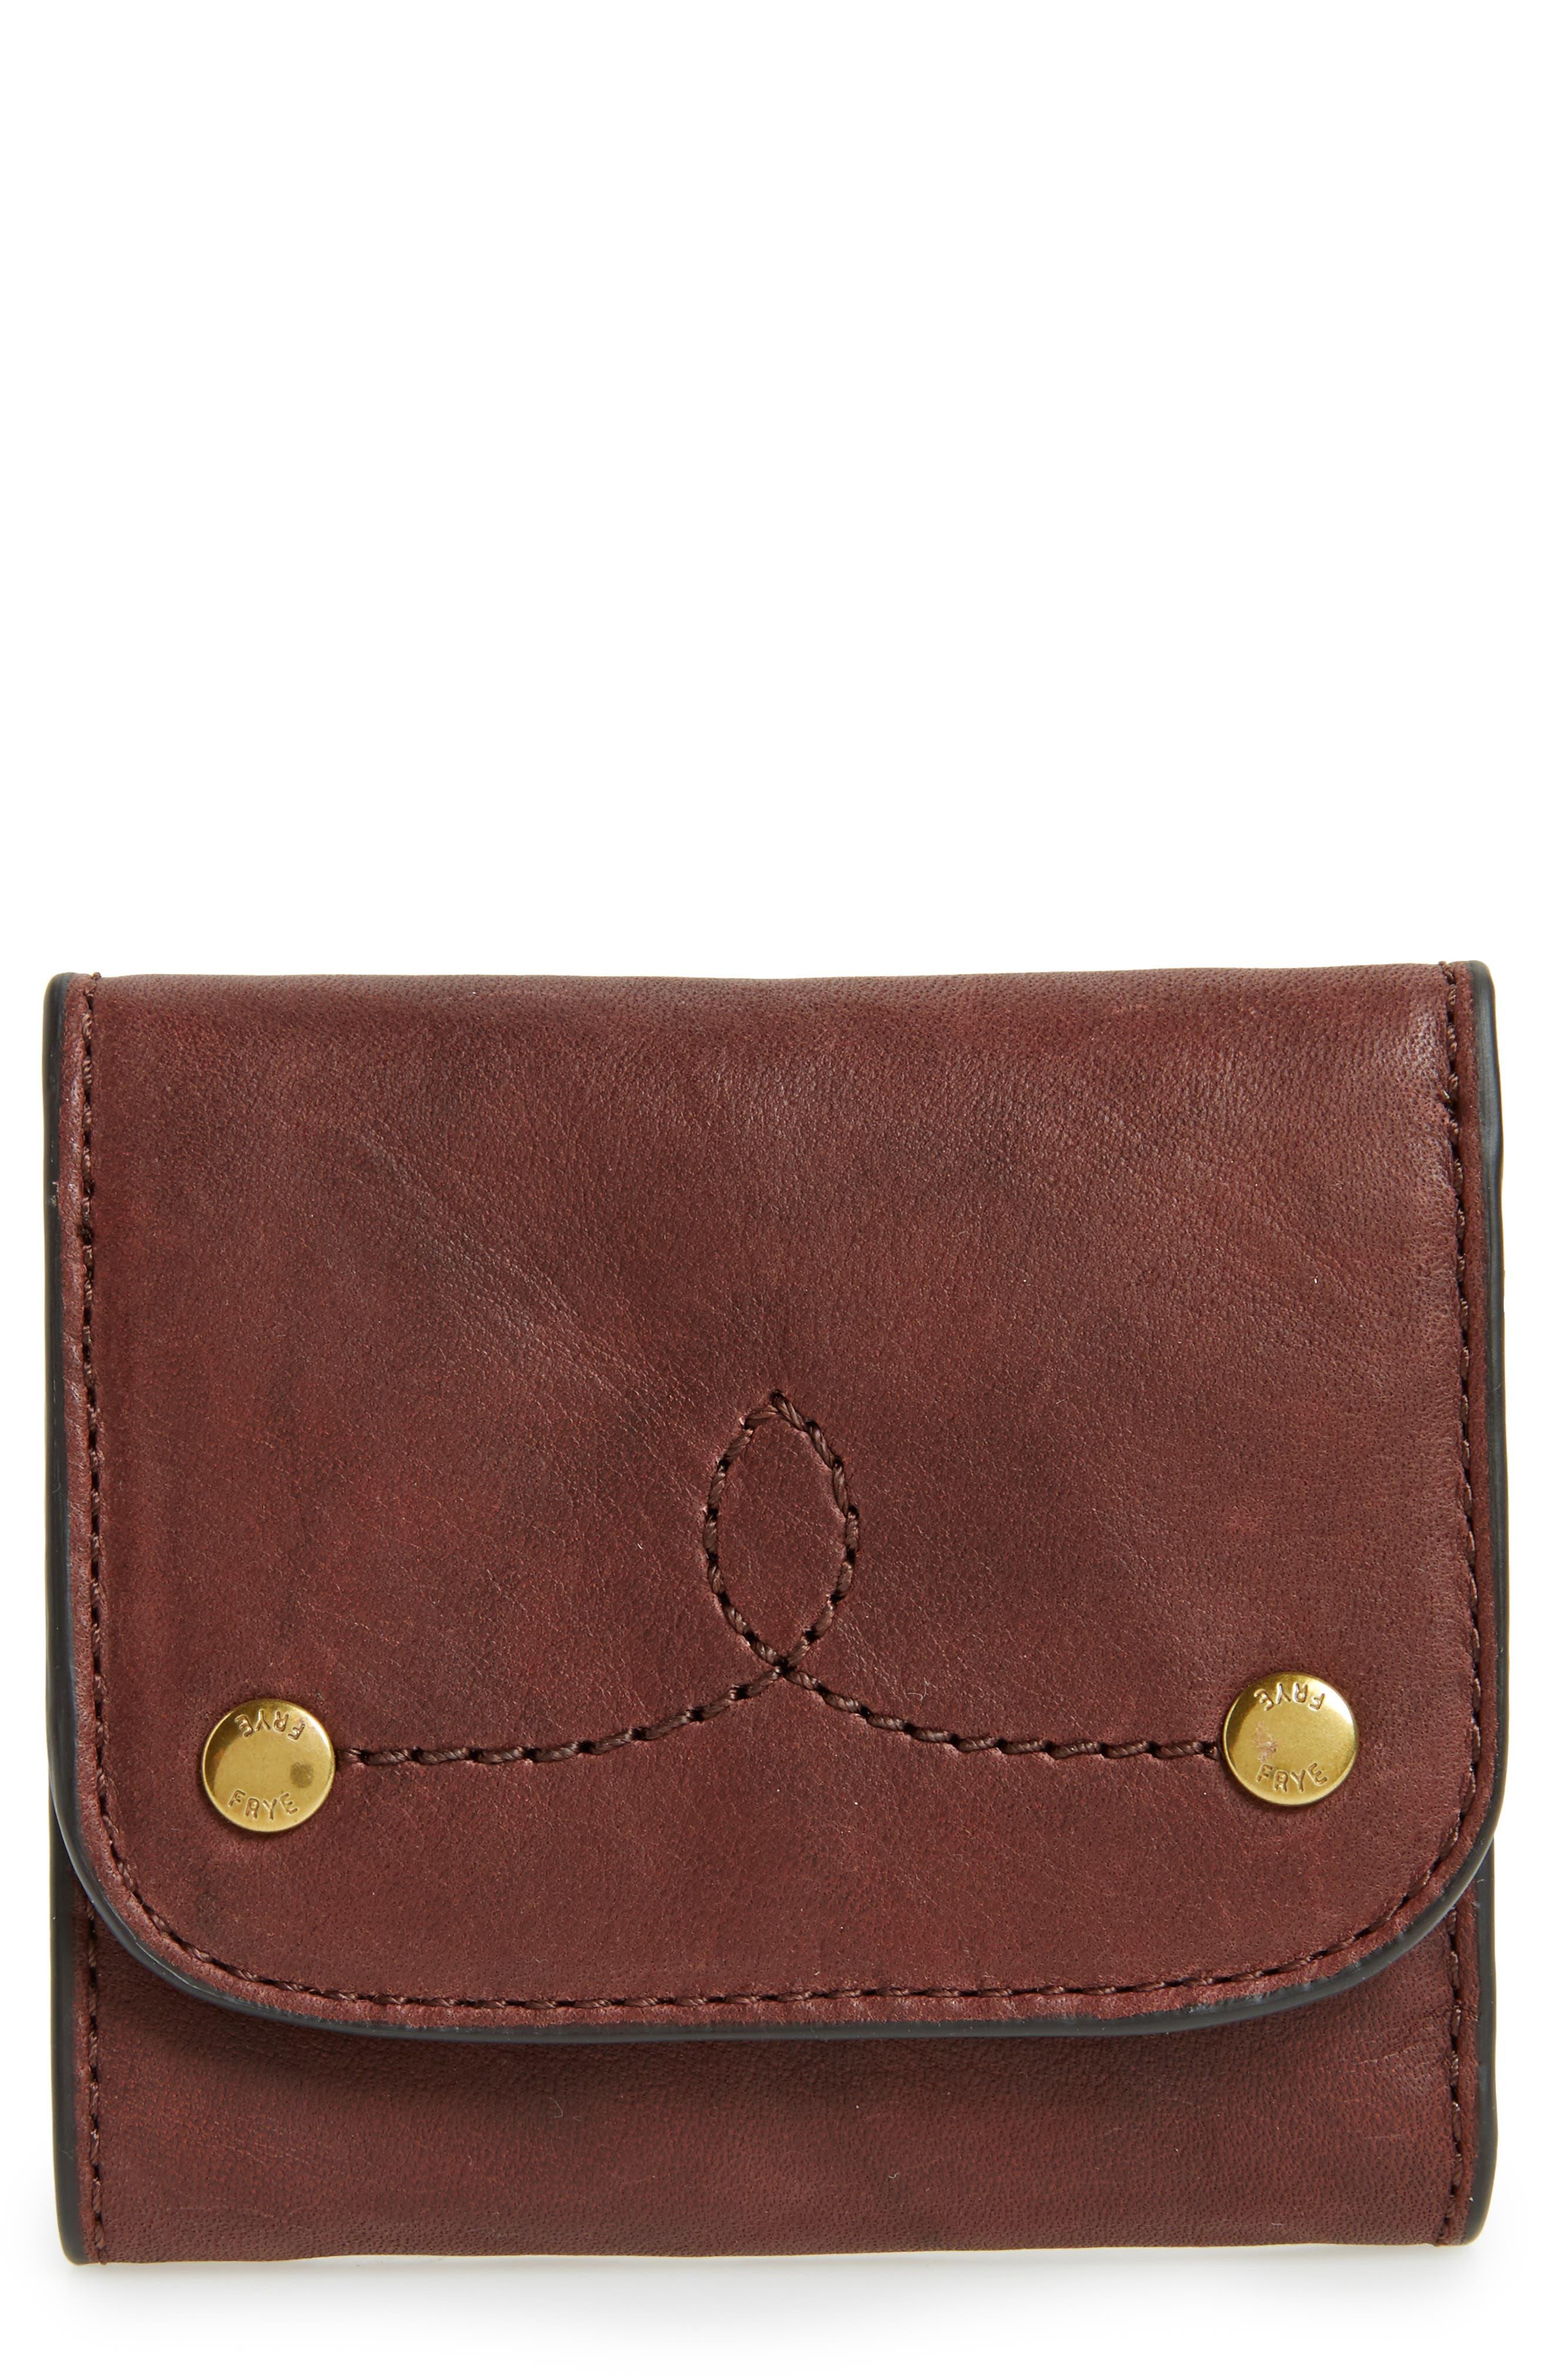 Medium Campus Rivet Leather Wallet,                         Main,                         color, 210